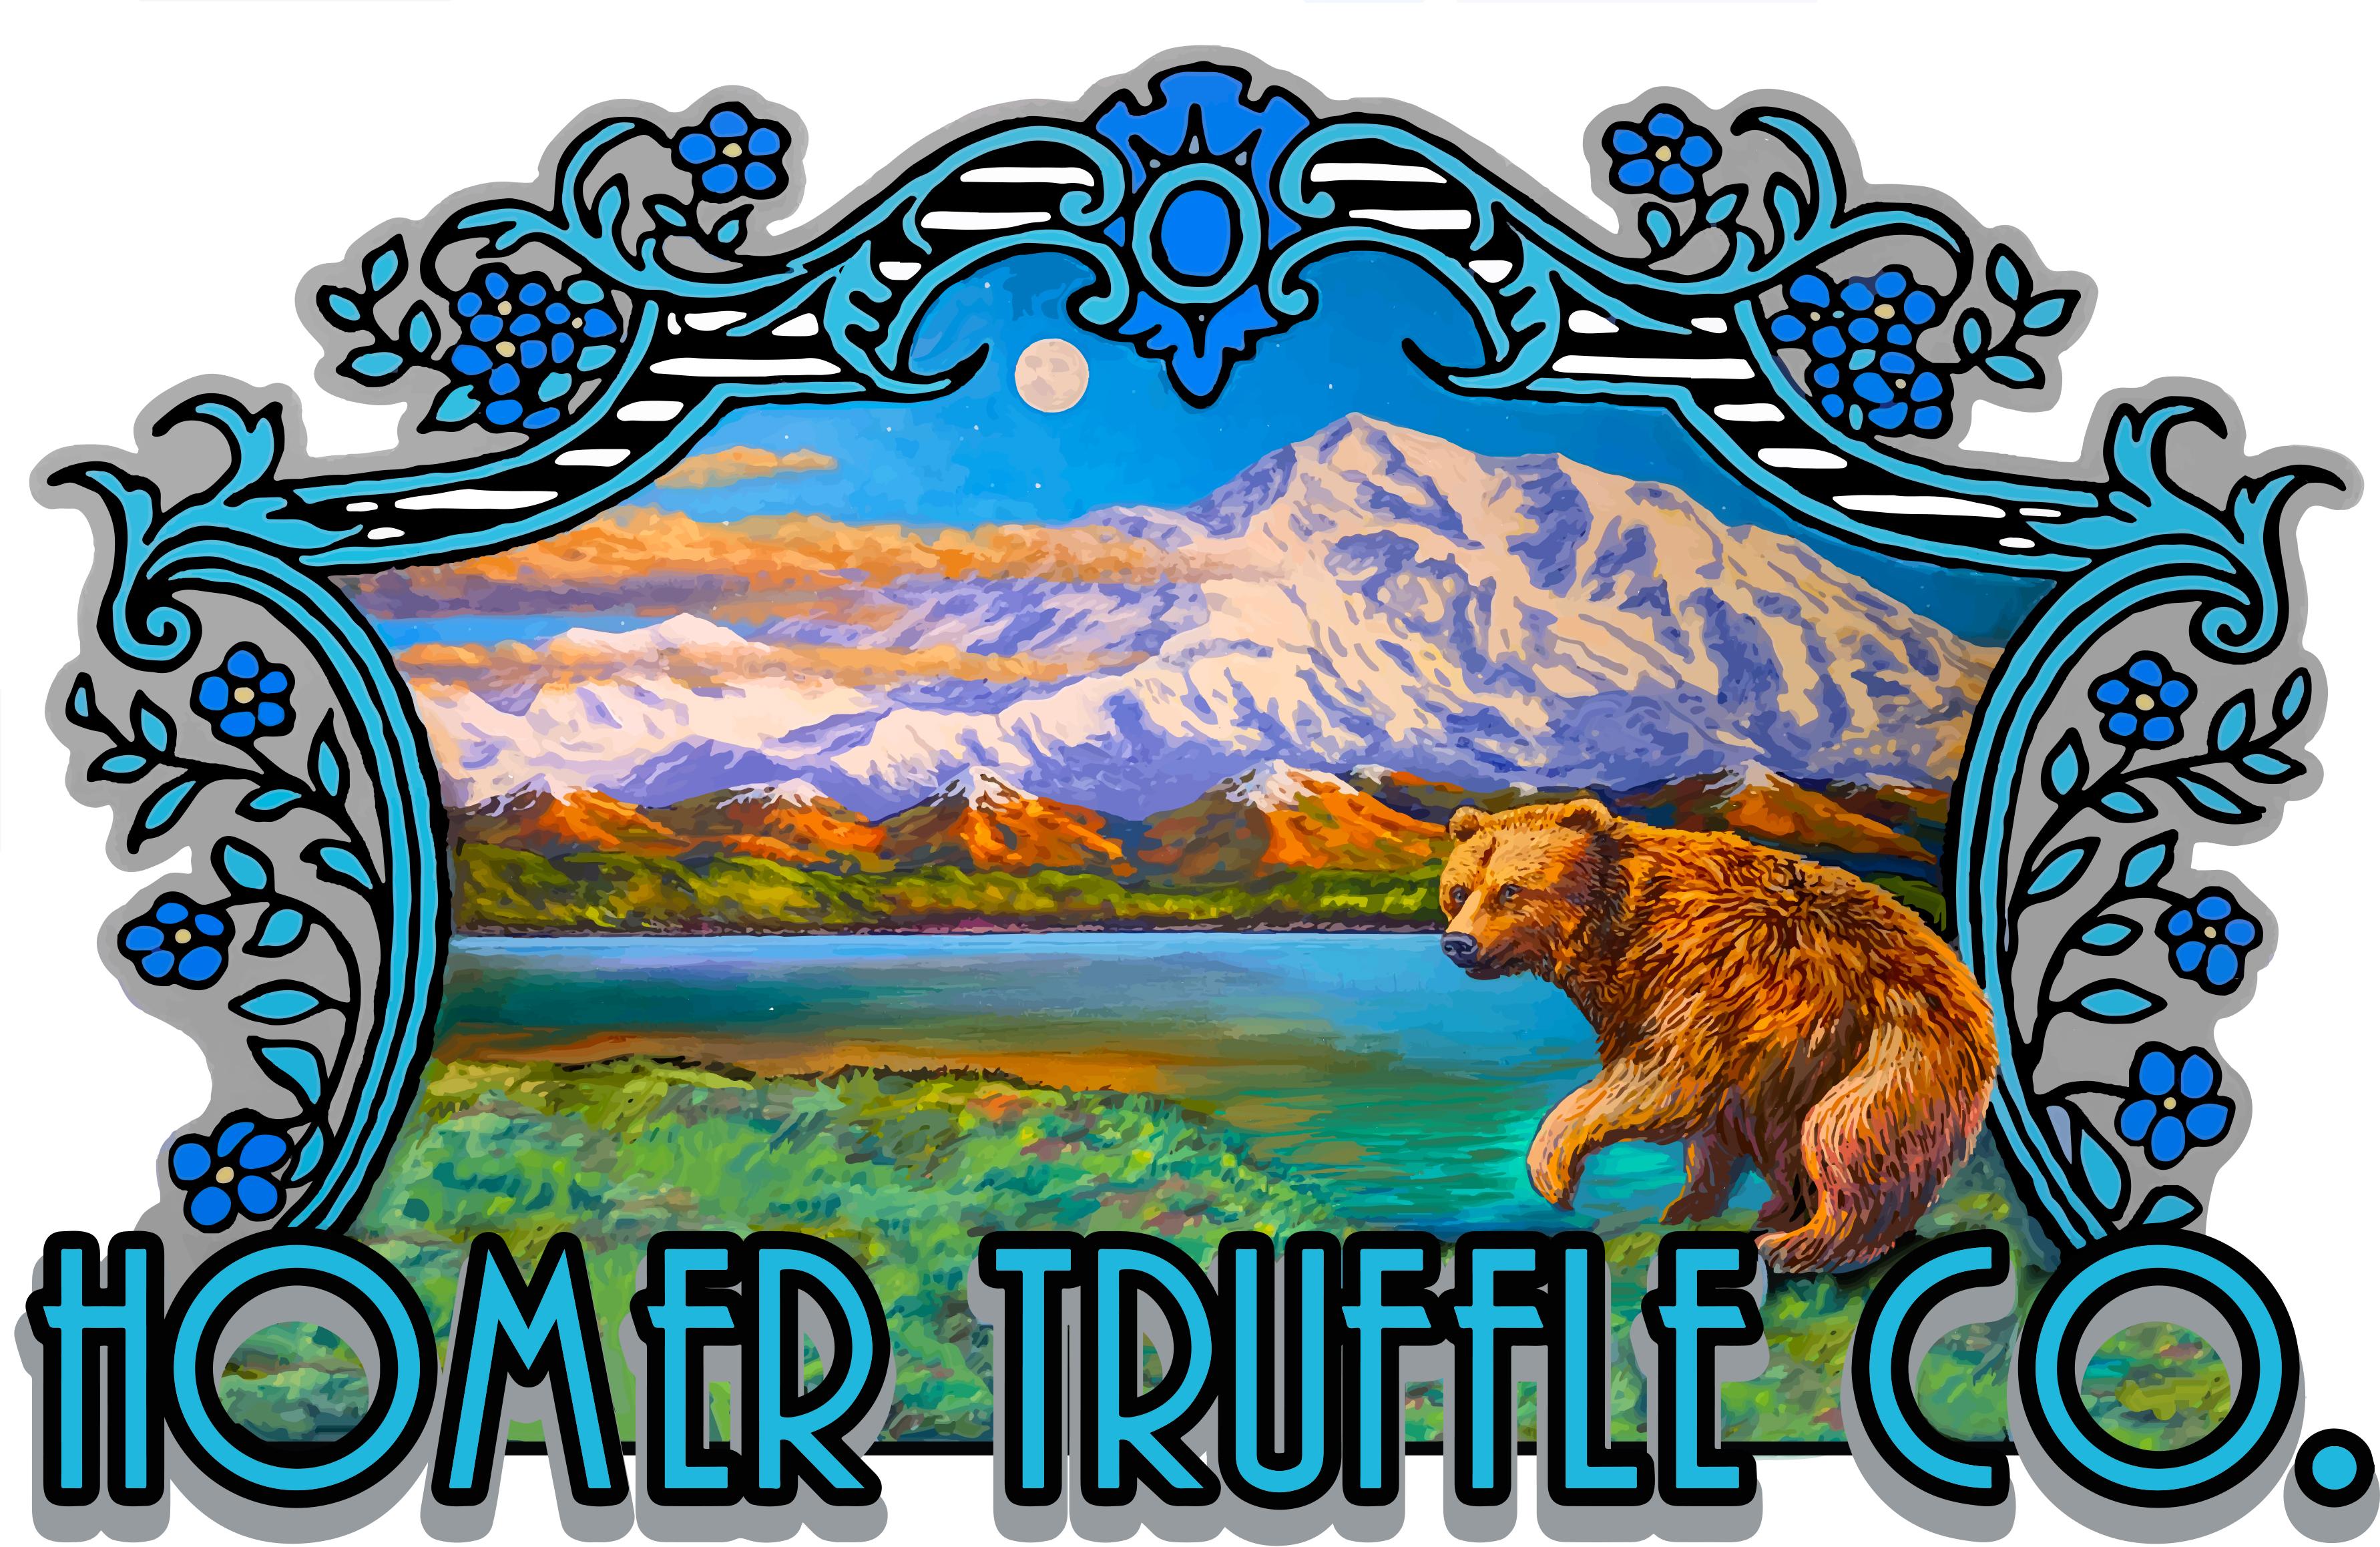 Homer Truffle Co